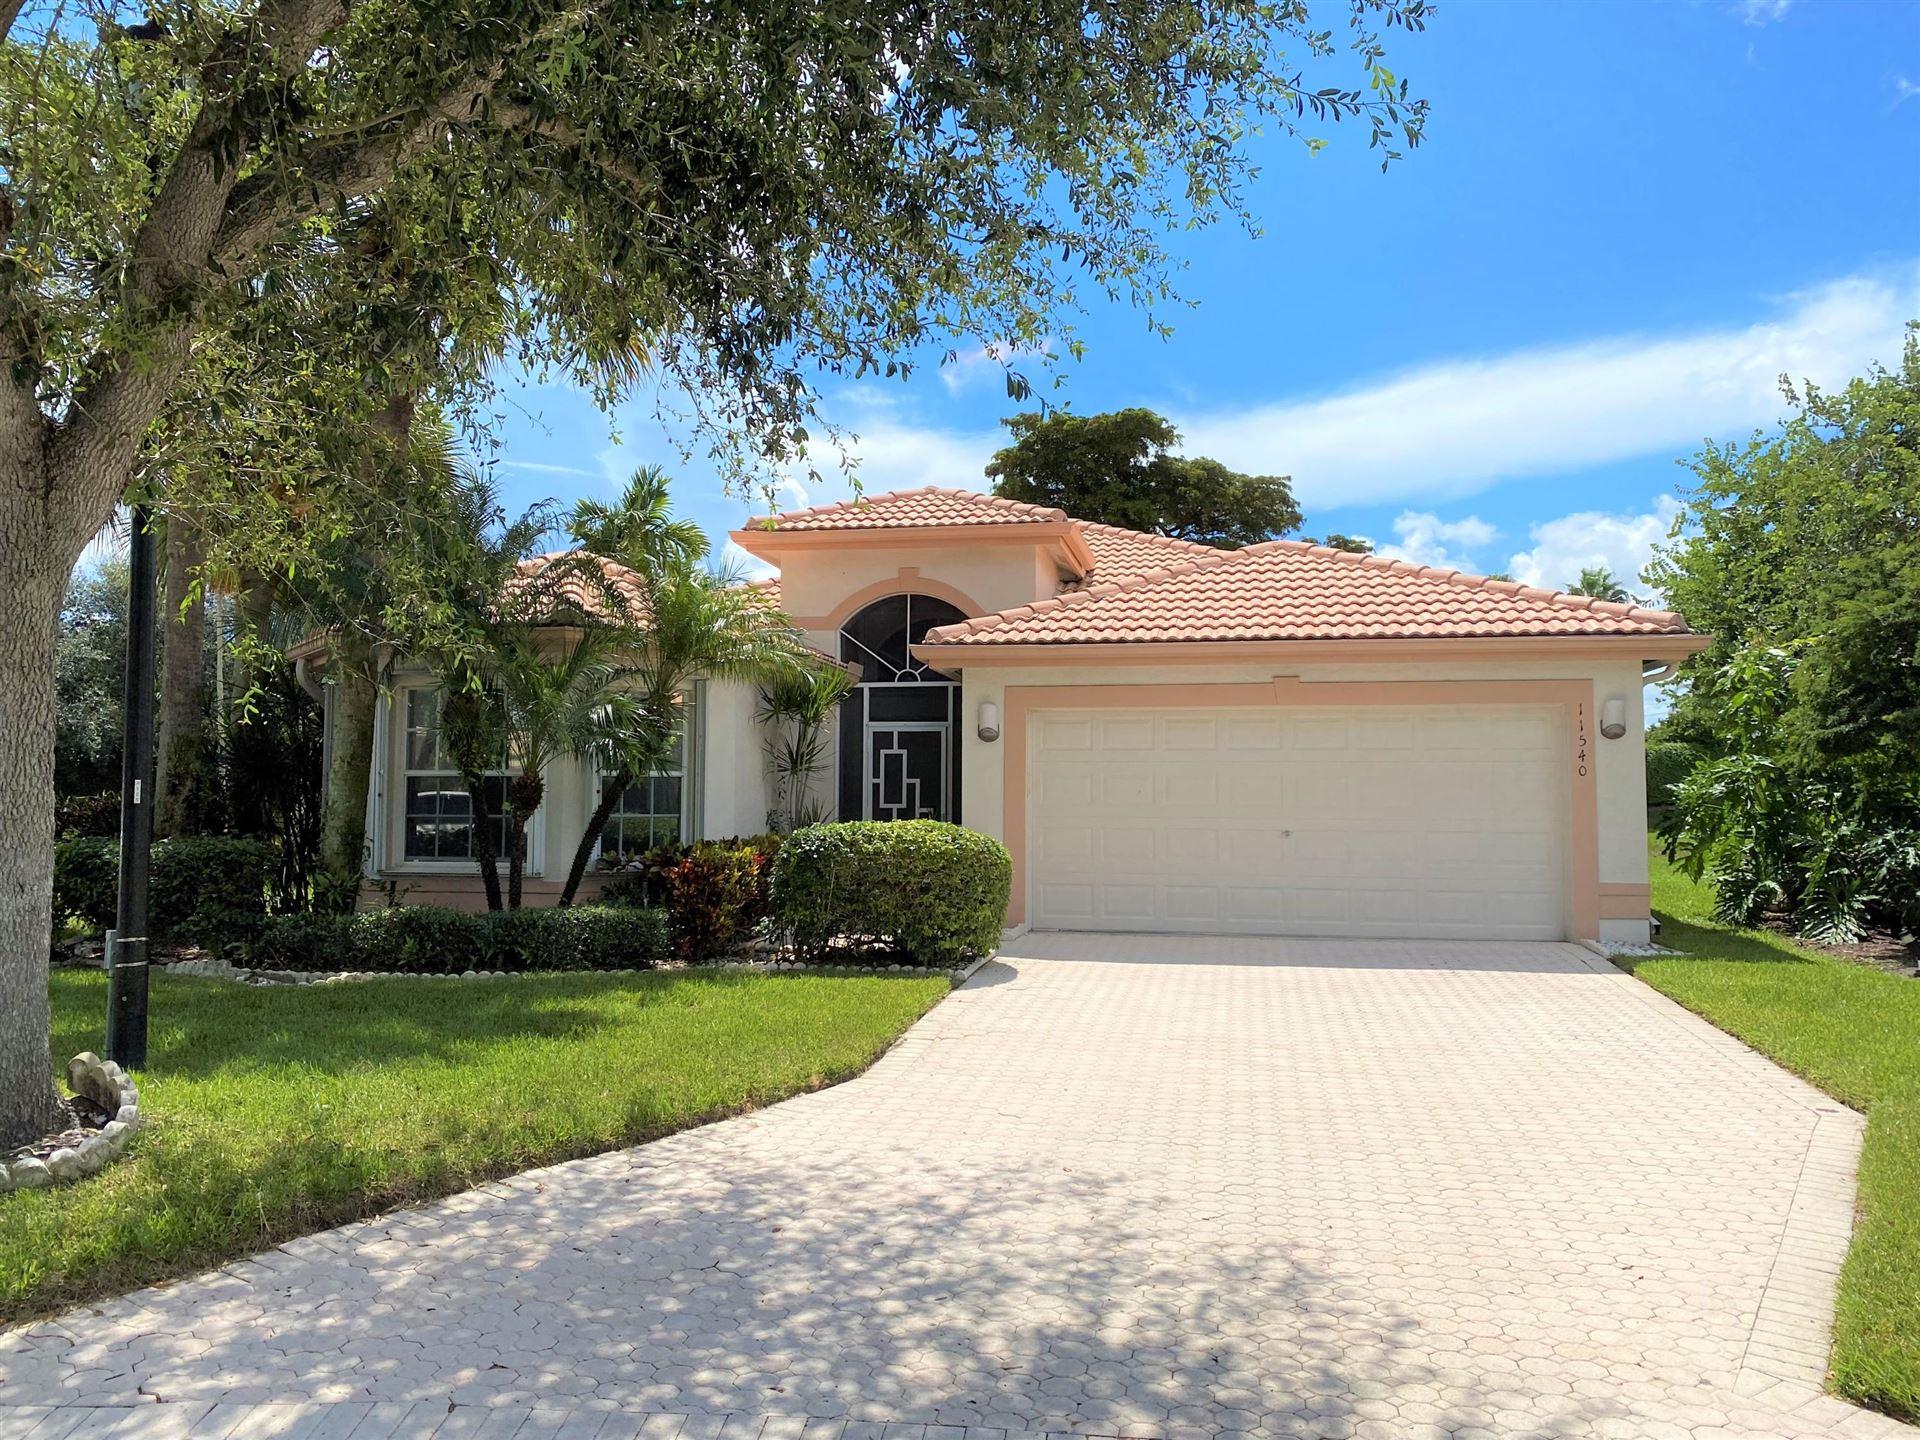 11540 Caledonia Court, Boynton Beach, FL 33437 - #: RX-10646205